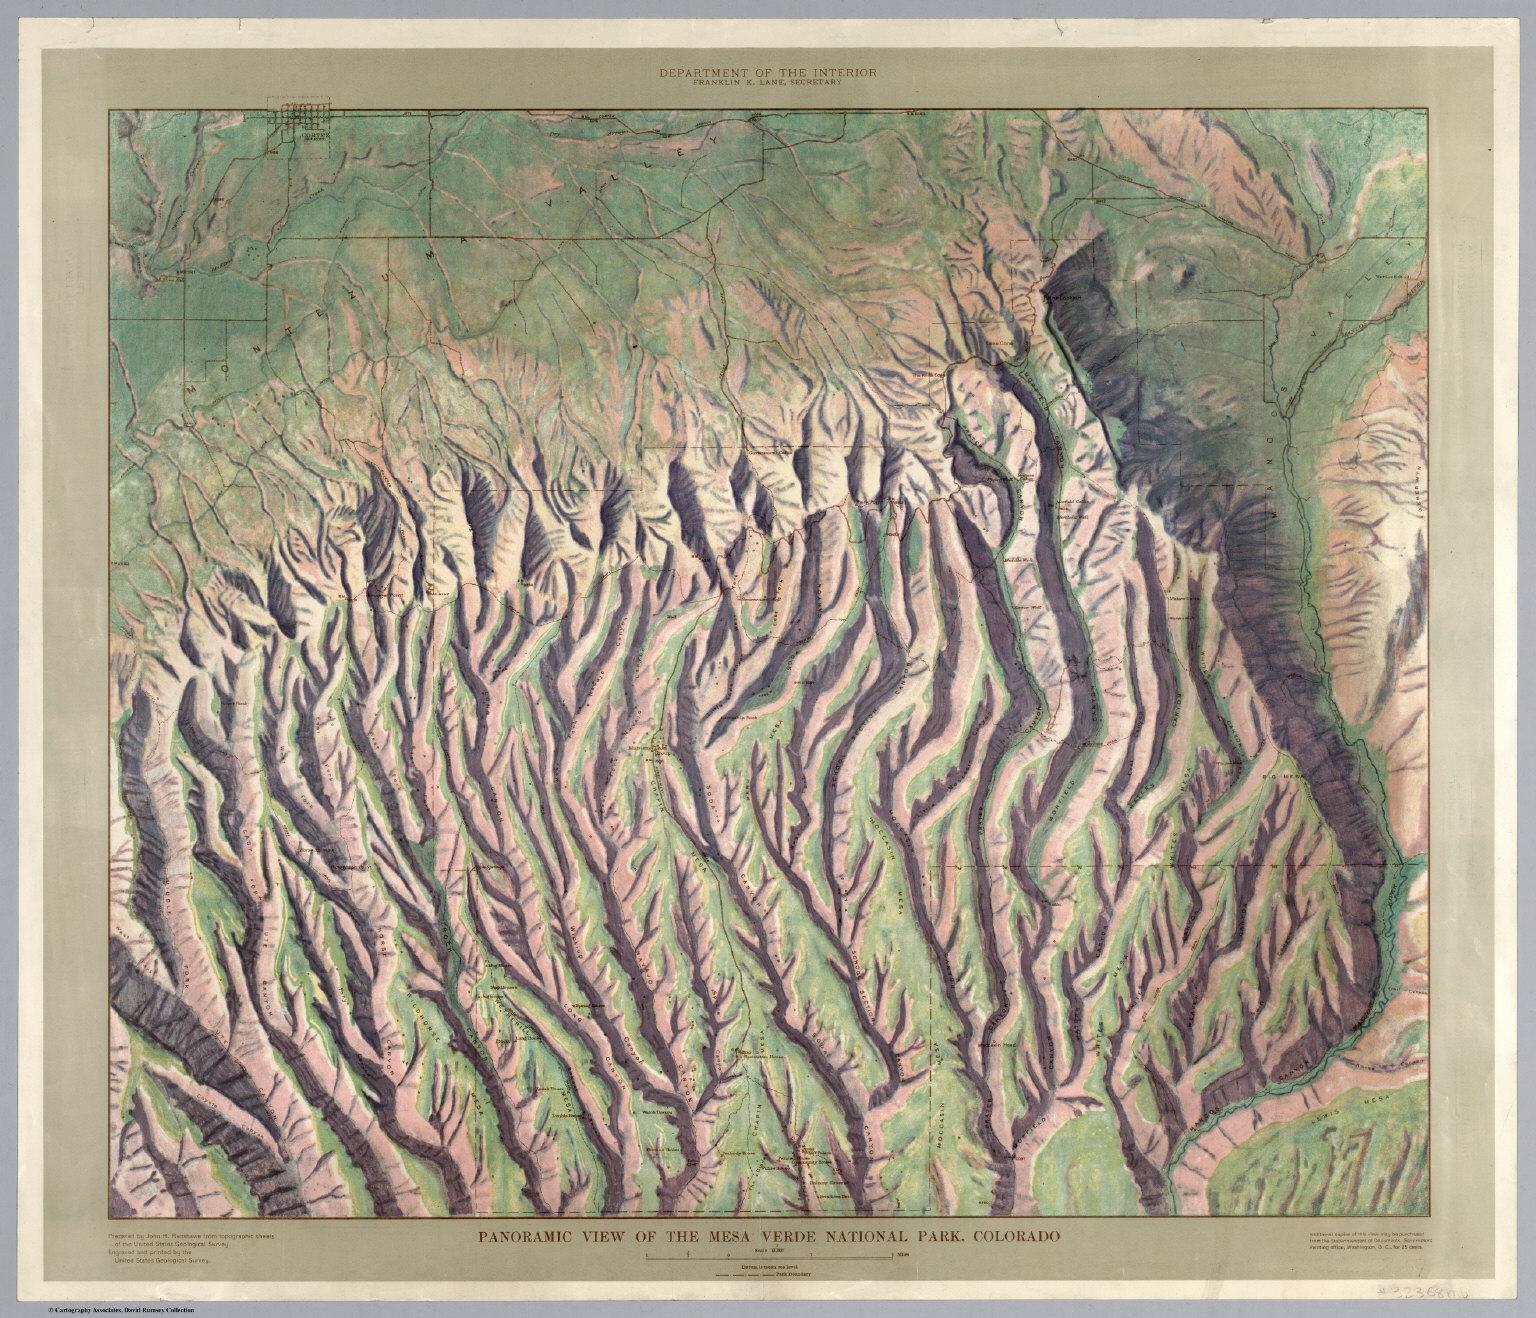 Panoramic View of the Mesa Verde National Park Colorado David